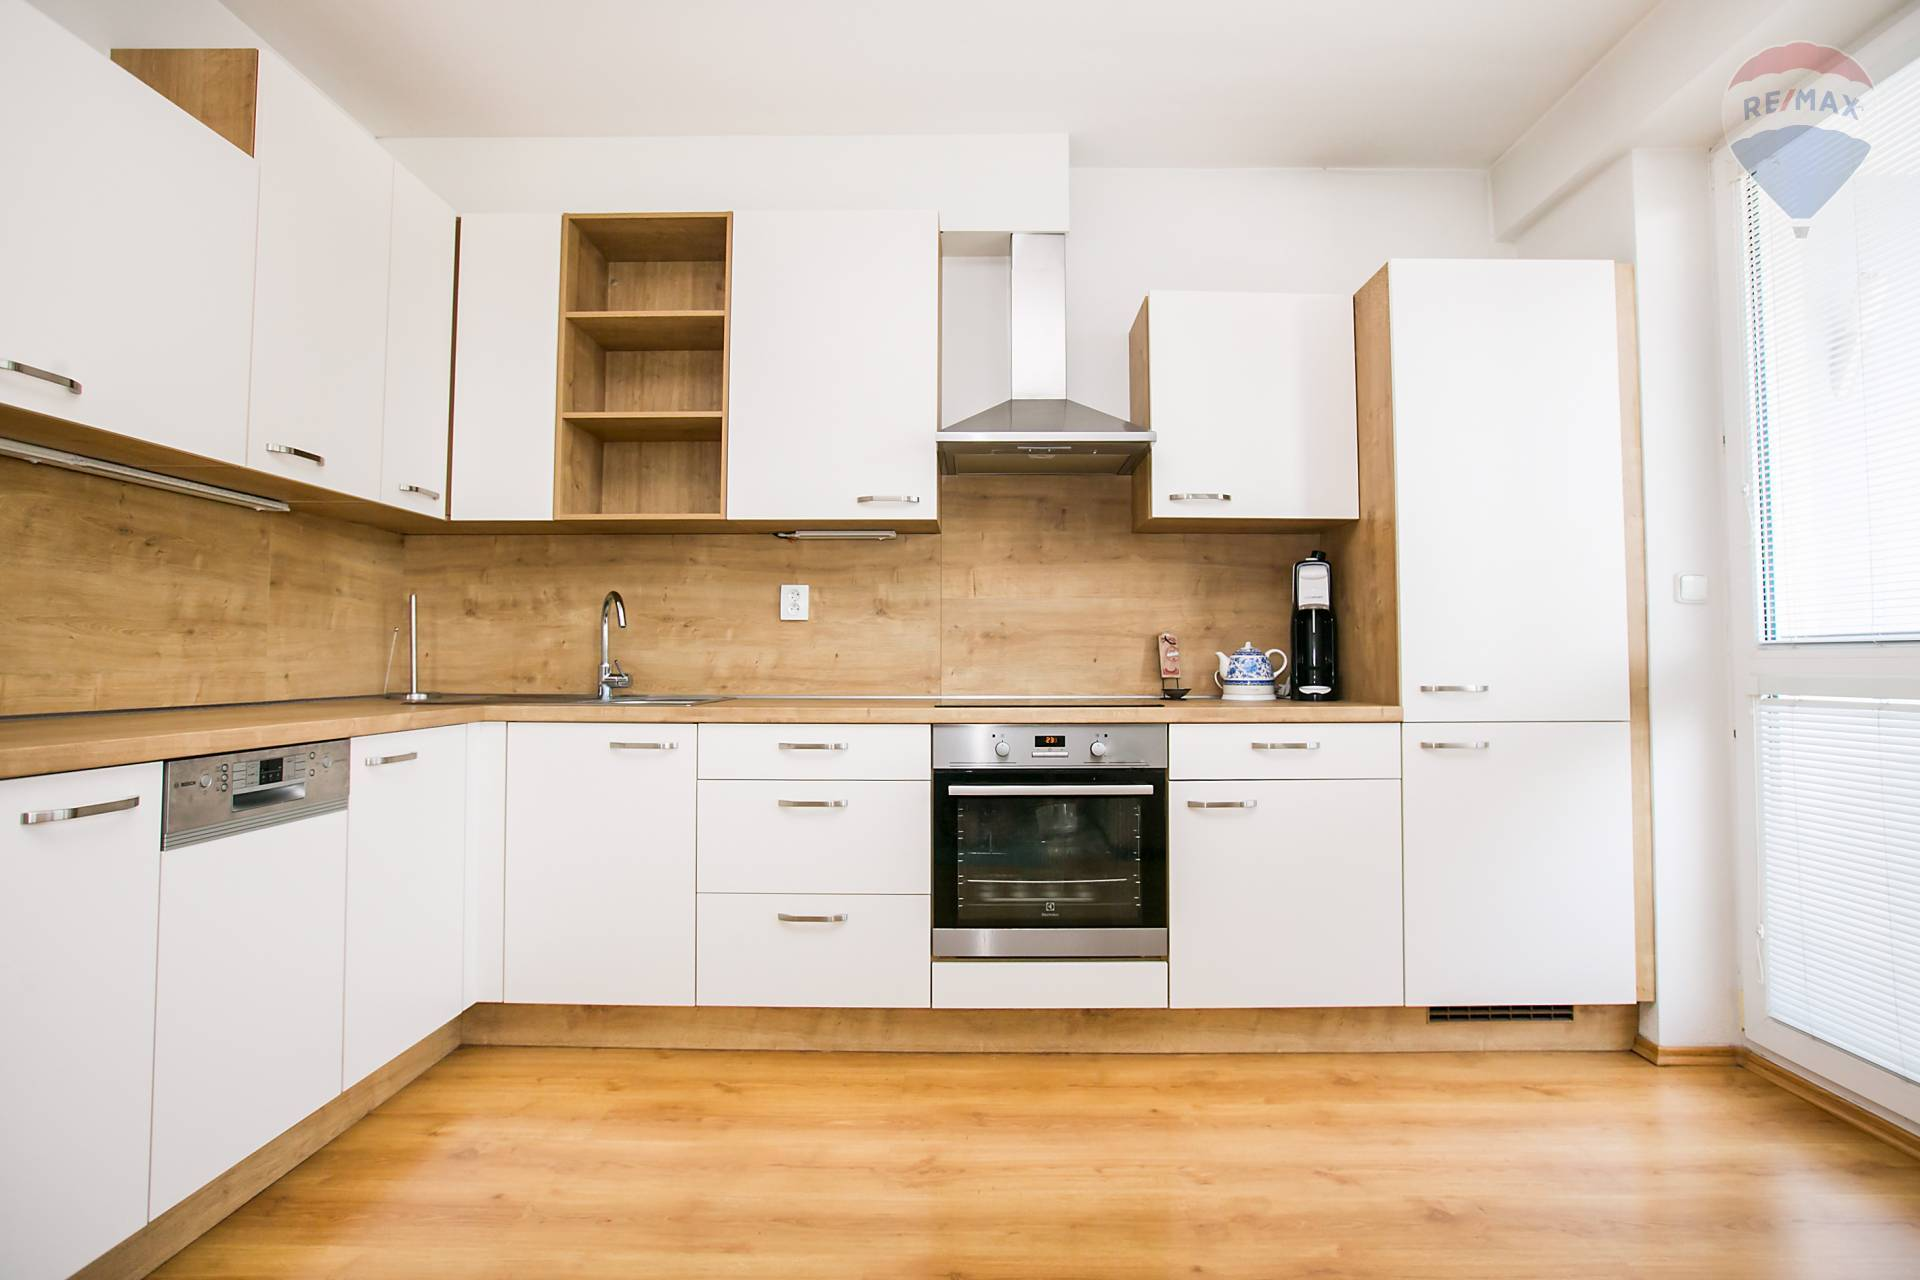 Prenájom bytu (2 izbový) 48 m2, Bratislava - Podunajské Biskupice - kuchynská linka